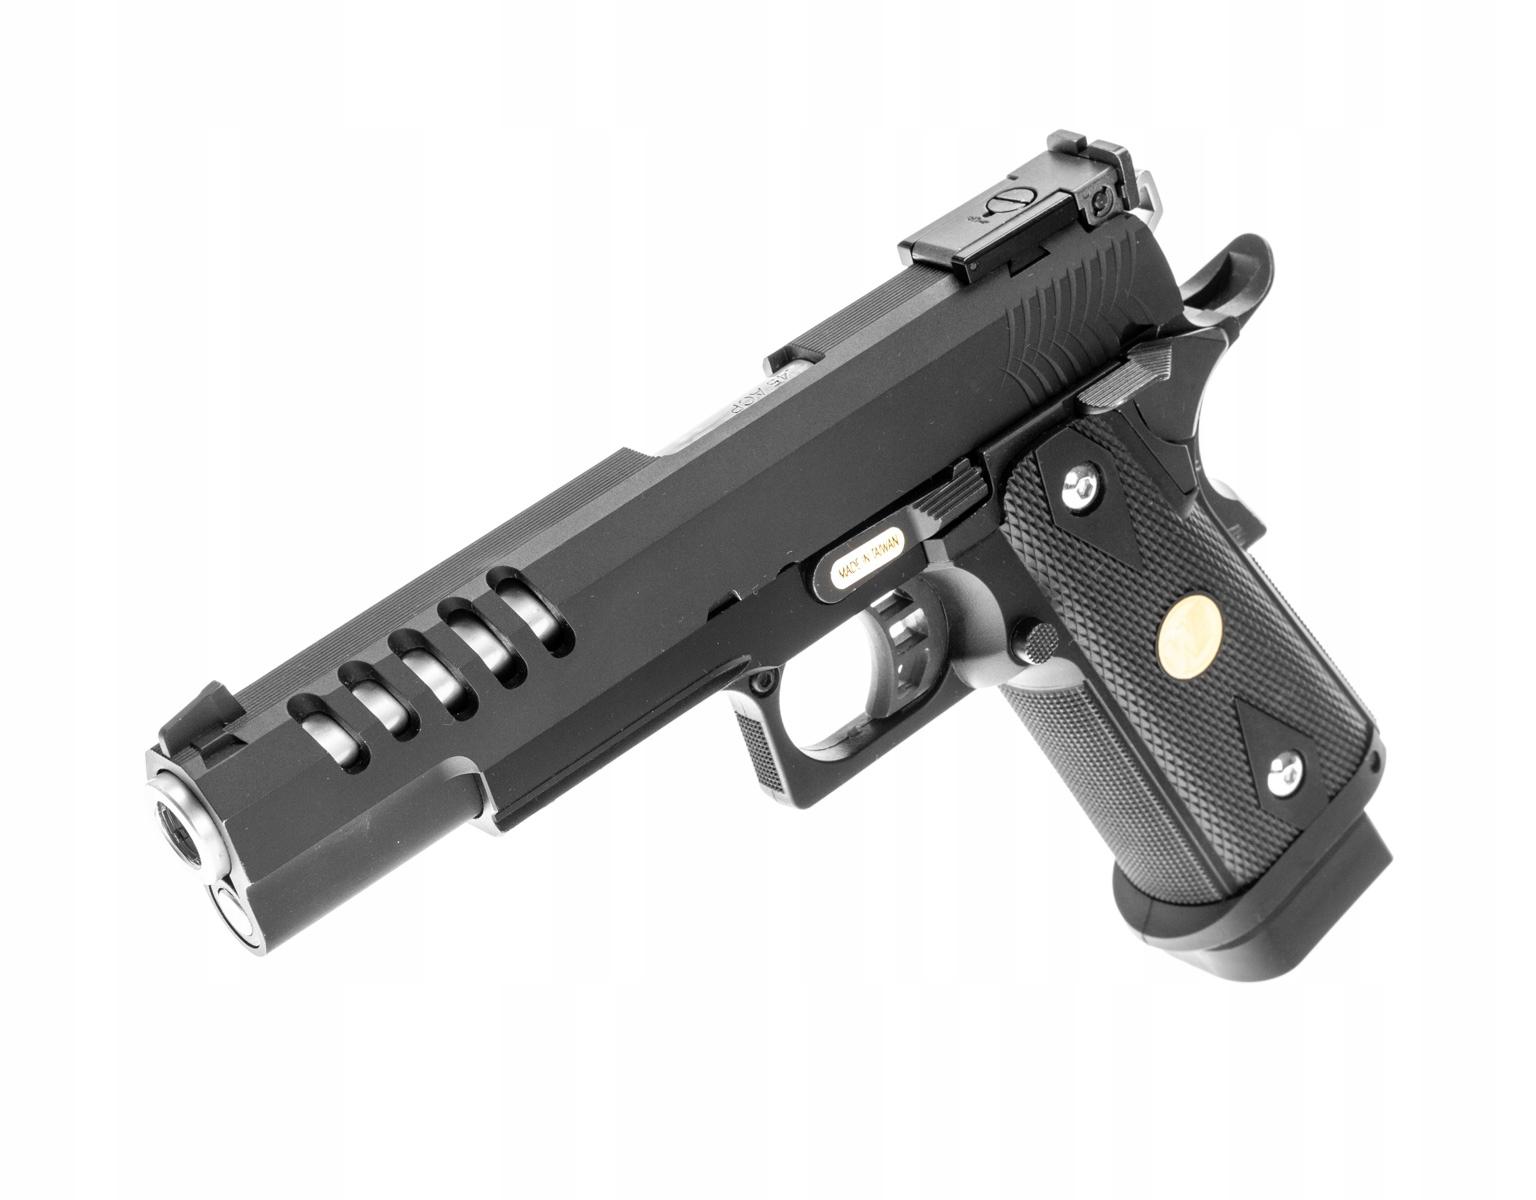 Pistolet WE GBB Hi-Capa 5.1 K